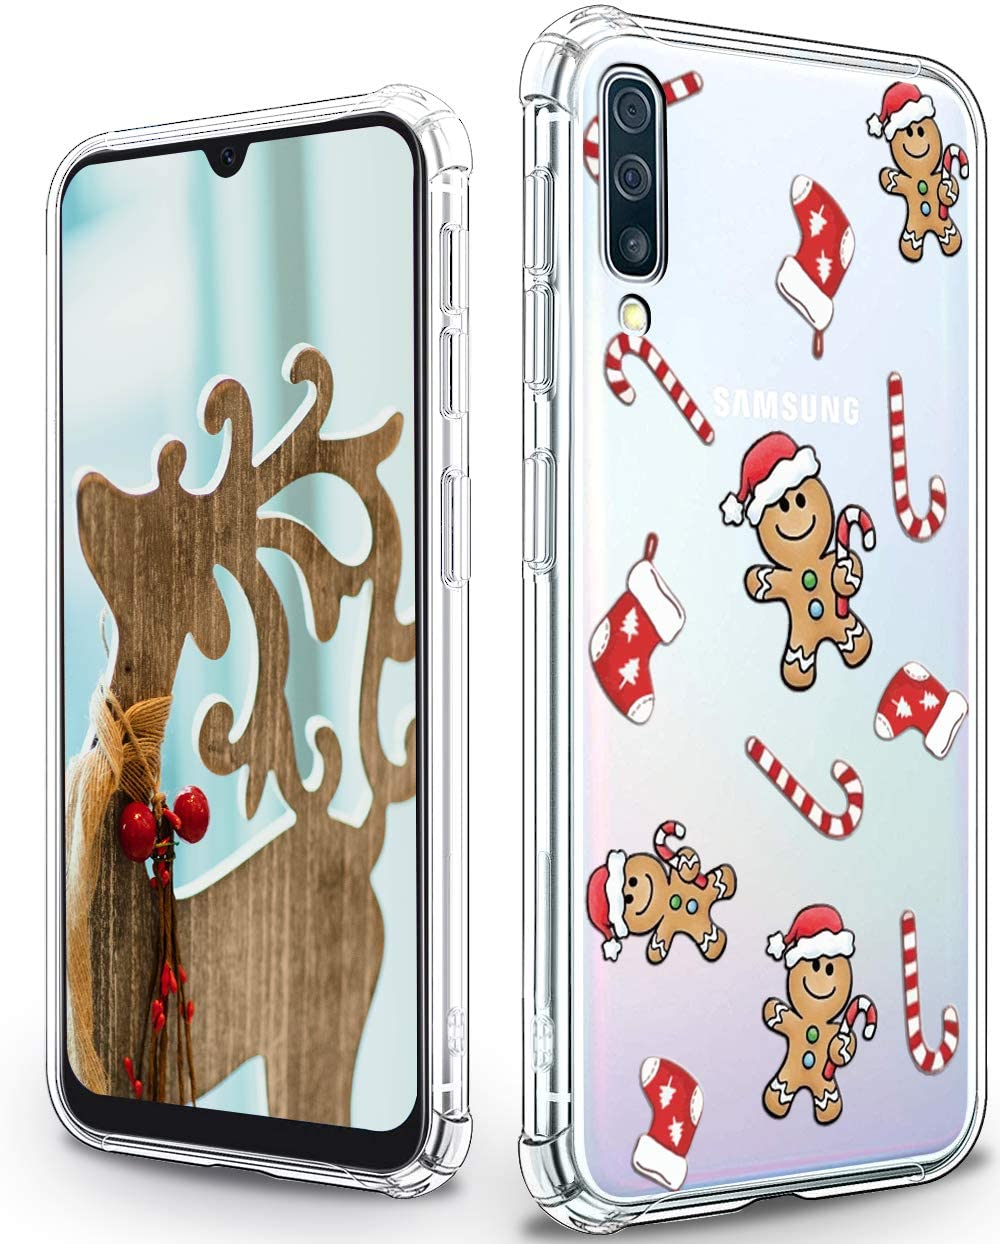 Samsung Galaxy A50 Case,Cute Gingerbread Man Patterns for Girls Women,Shockproof Slim Fit TPU Cover Protective Phone Case for Samsung Galaxy A50 - Gingerbread Man